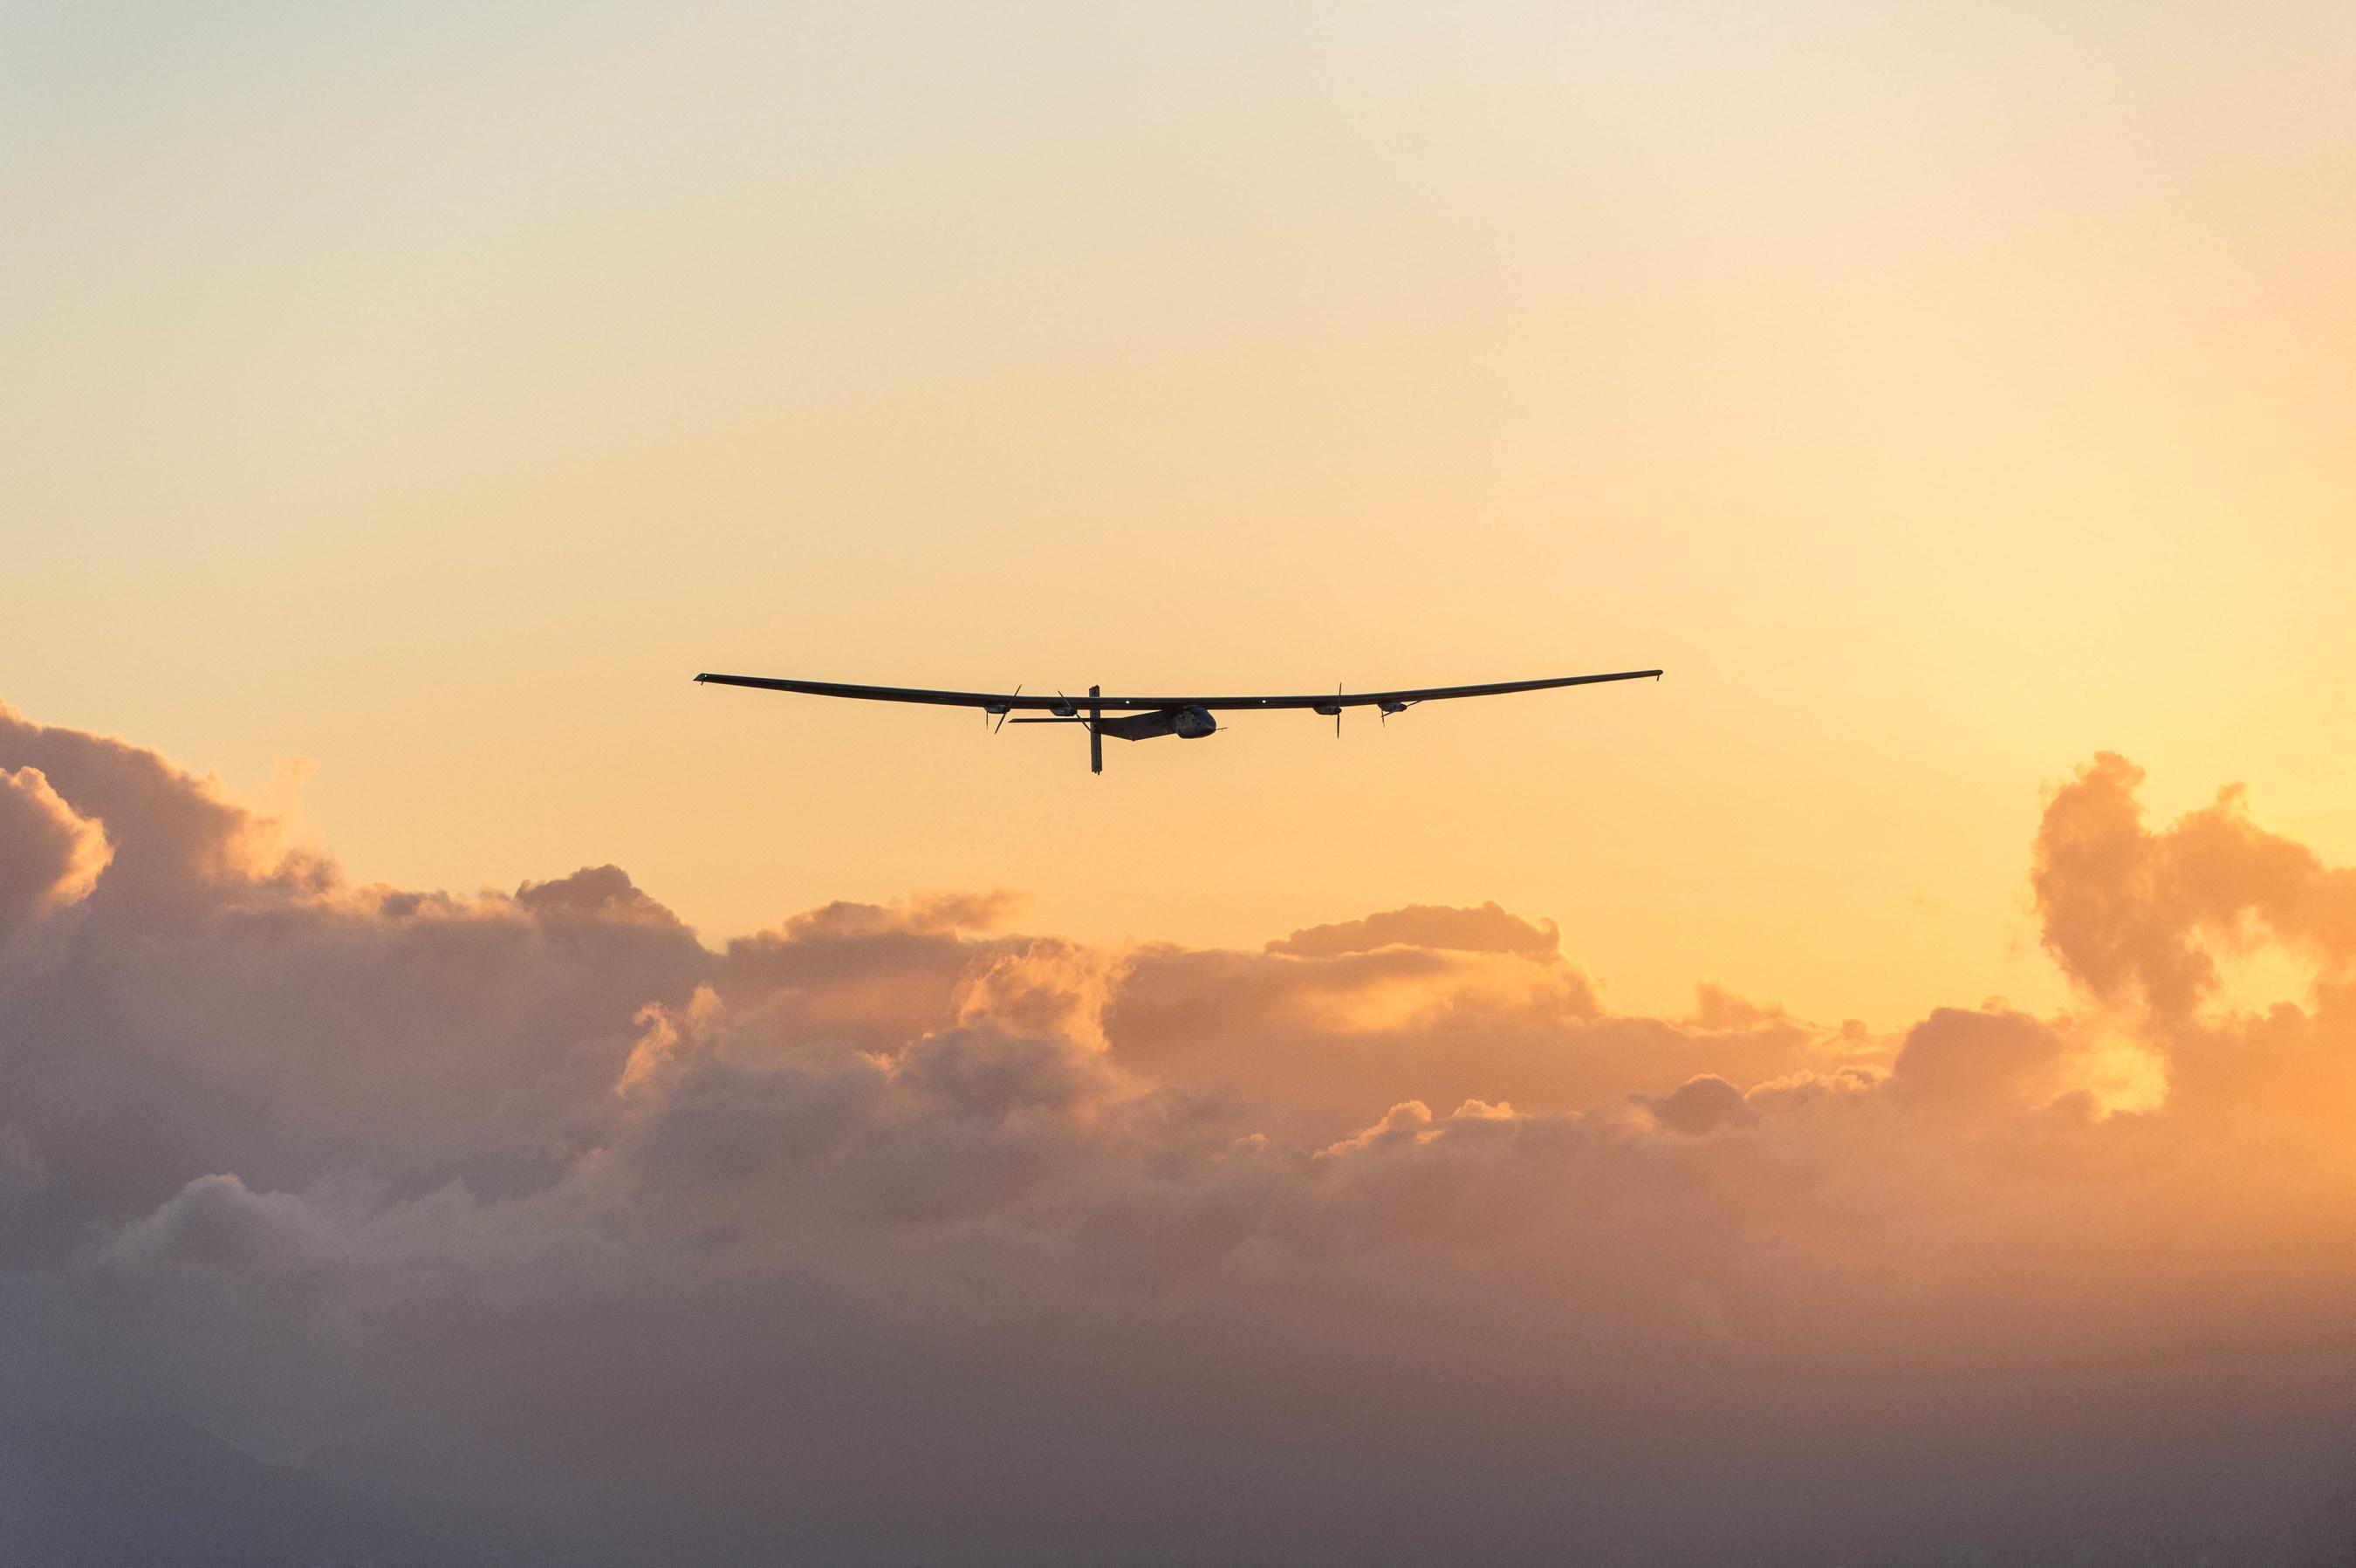 Solar Impulse test flight over Hawaii